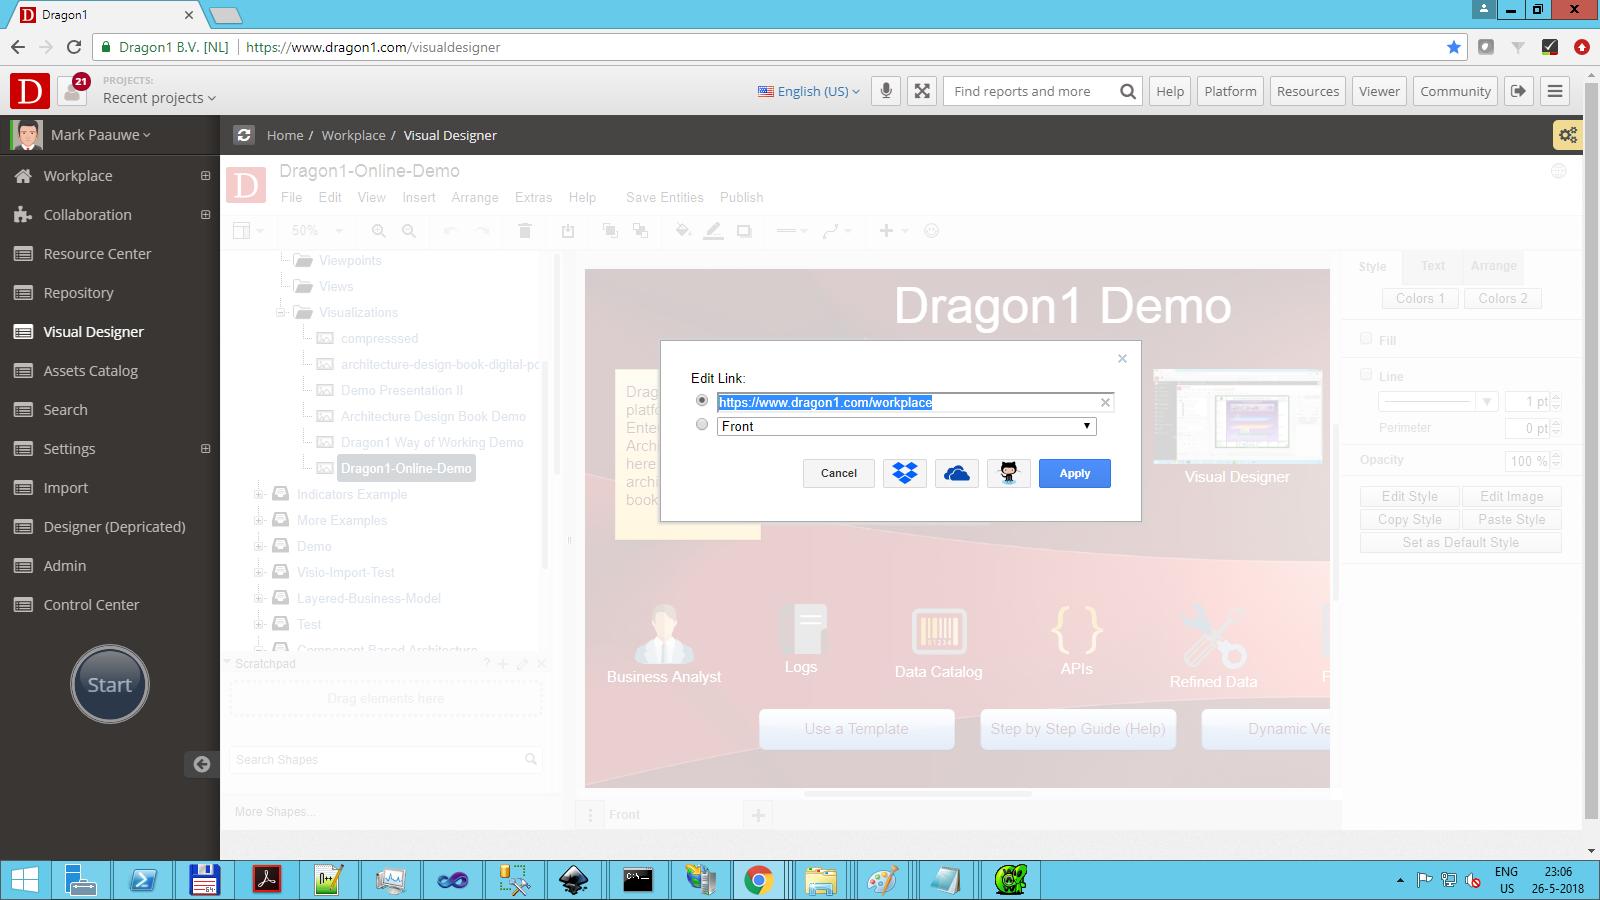 dragon1 set up clickable link for visualization